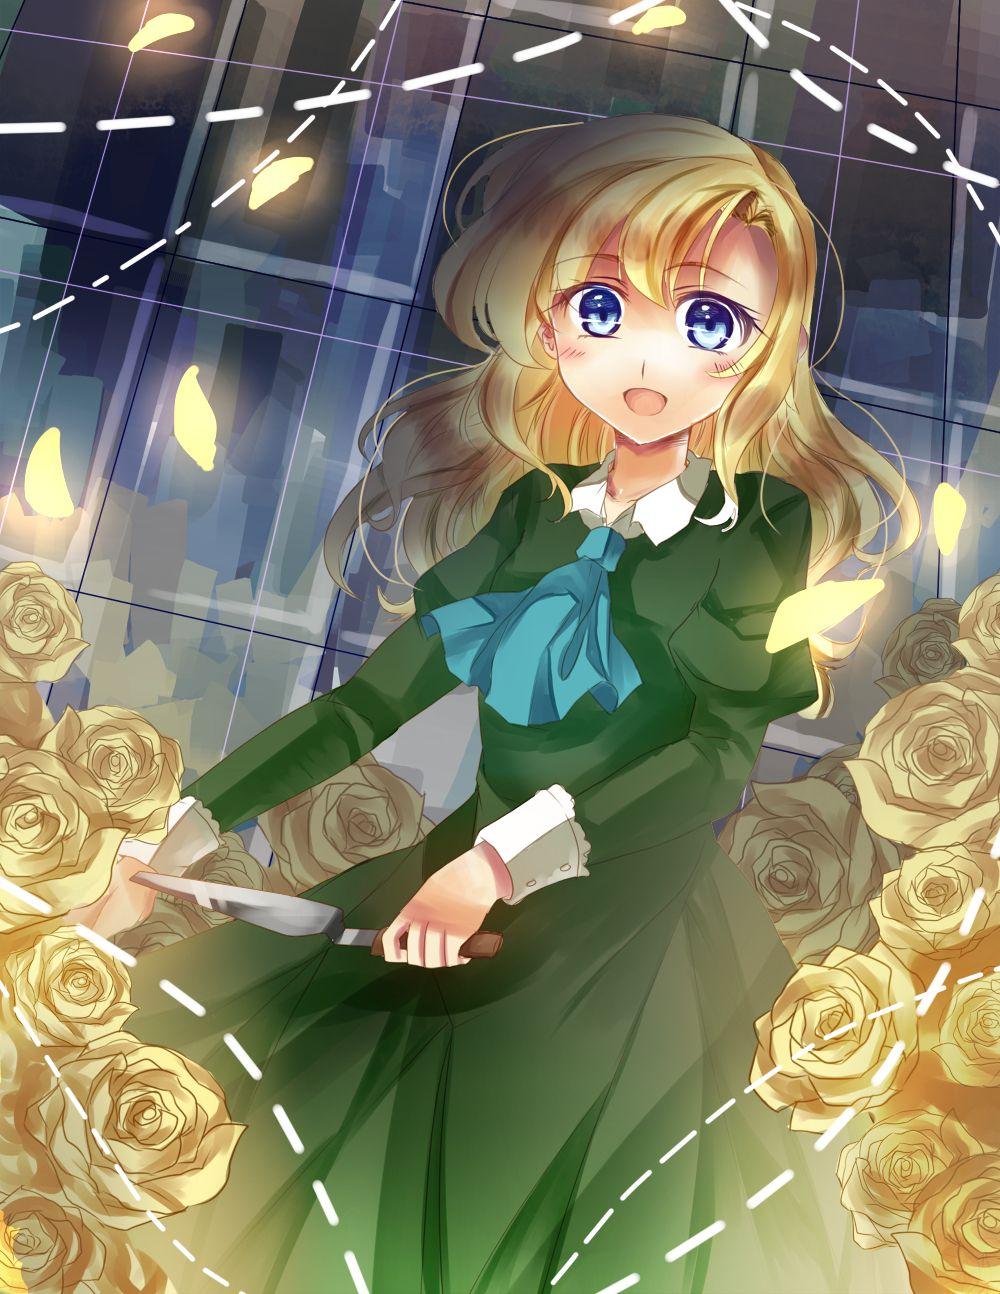 RPG Maker-Girls ~Mogeko~ by TheRainbowCupcake on DeviantArt